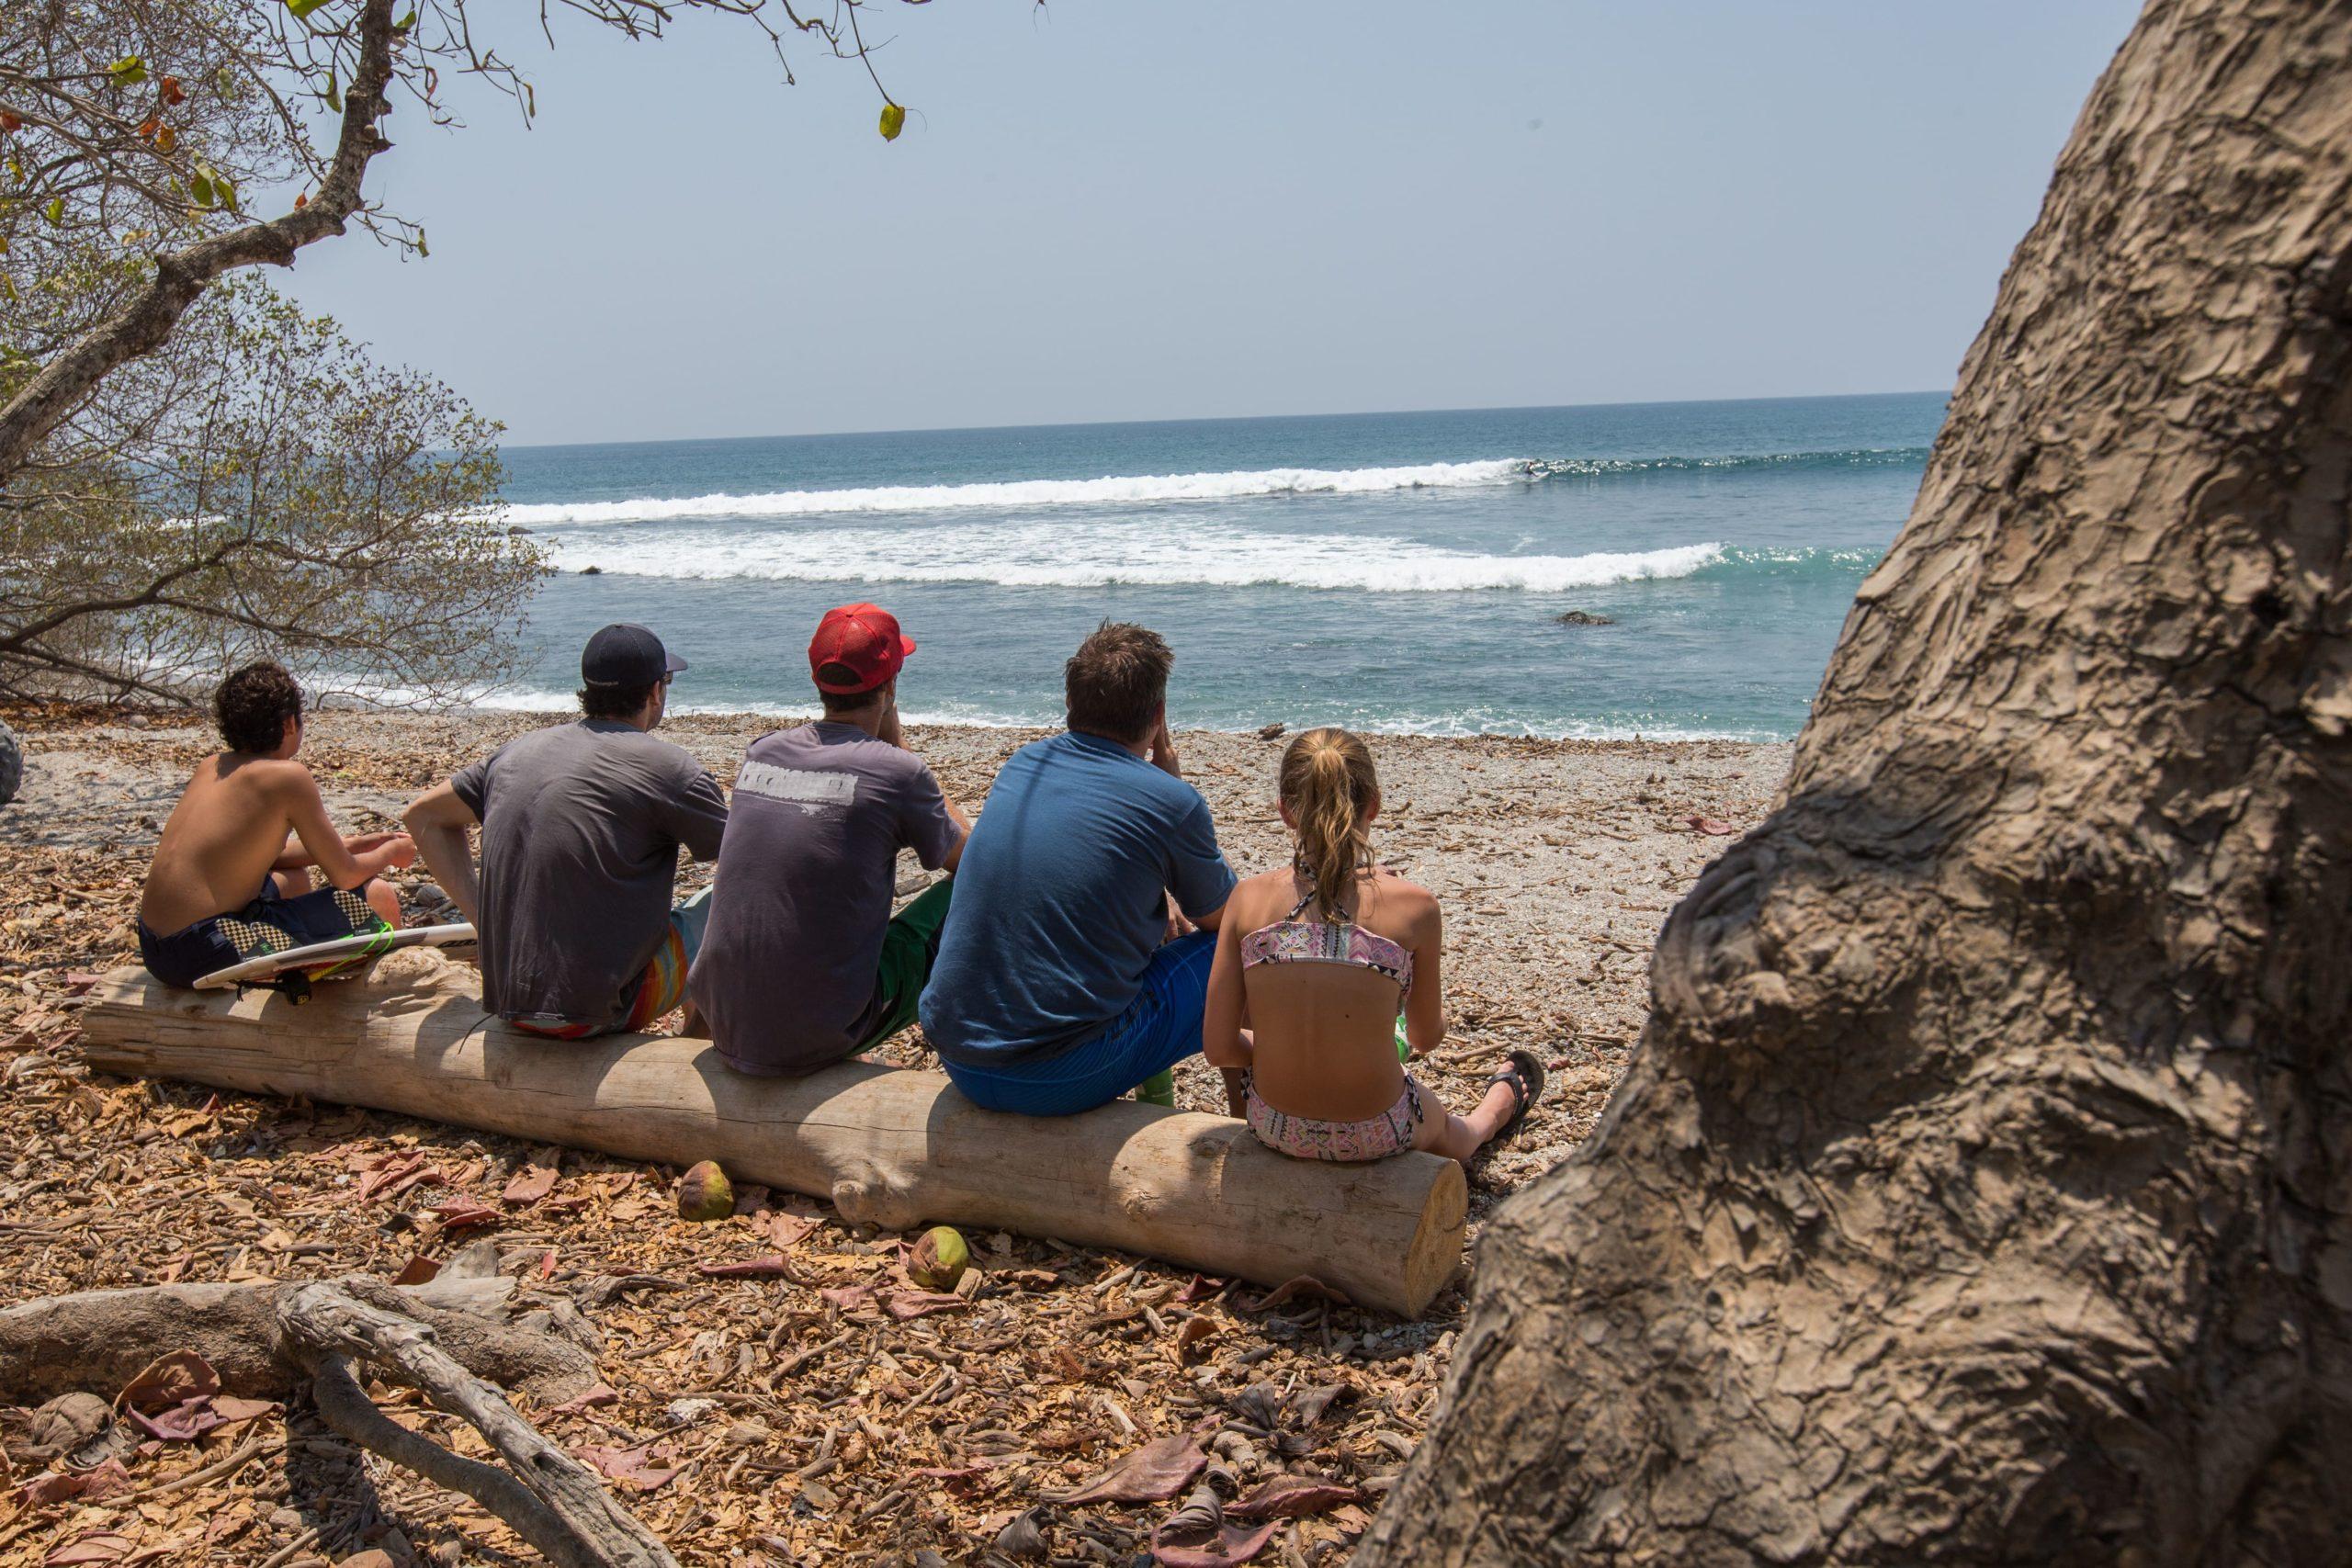 Playa Santa Teresa Surf Spot